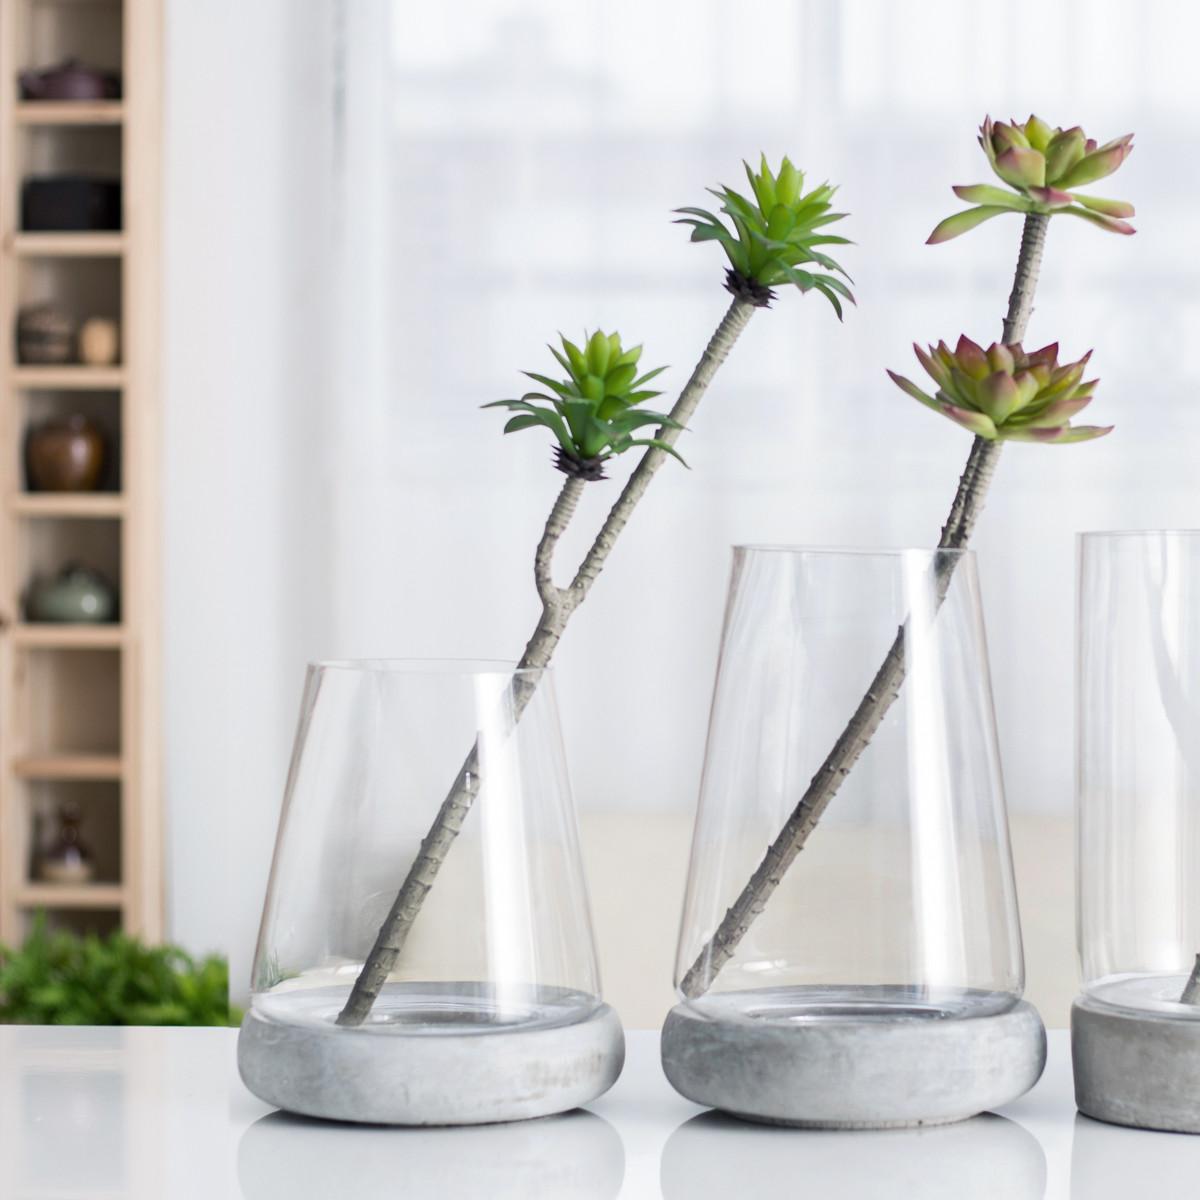 glass tube flower vase of usd 25 42 sicily home cas series nordic minimalist glass vase with regard to sicily home cas series nordic minimalist glass vase cement underpinning home decoration flower arrangement